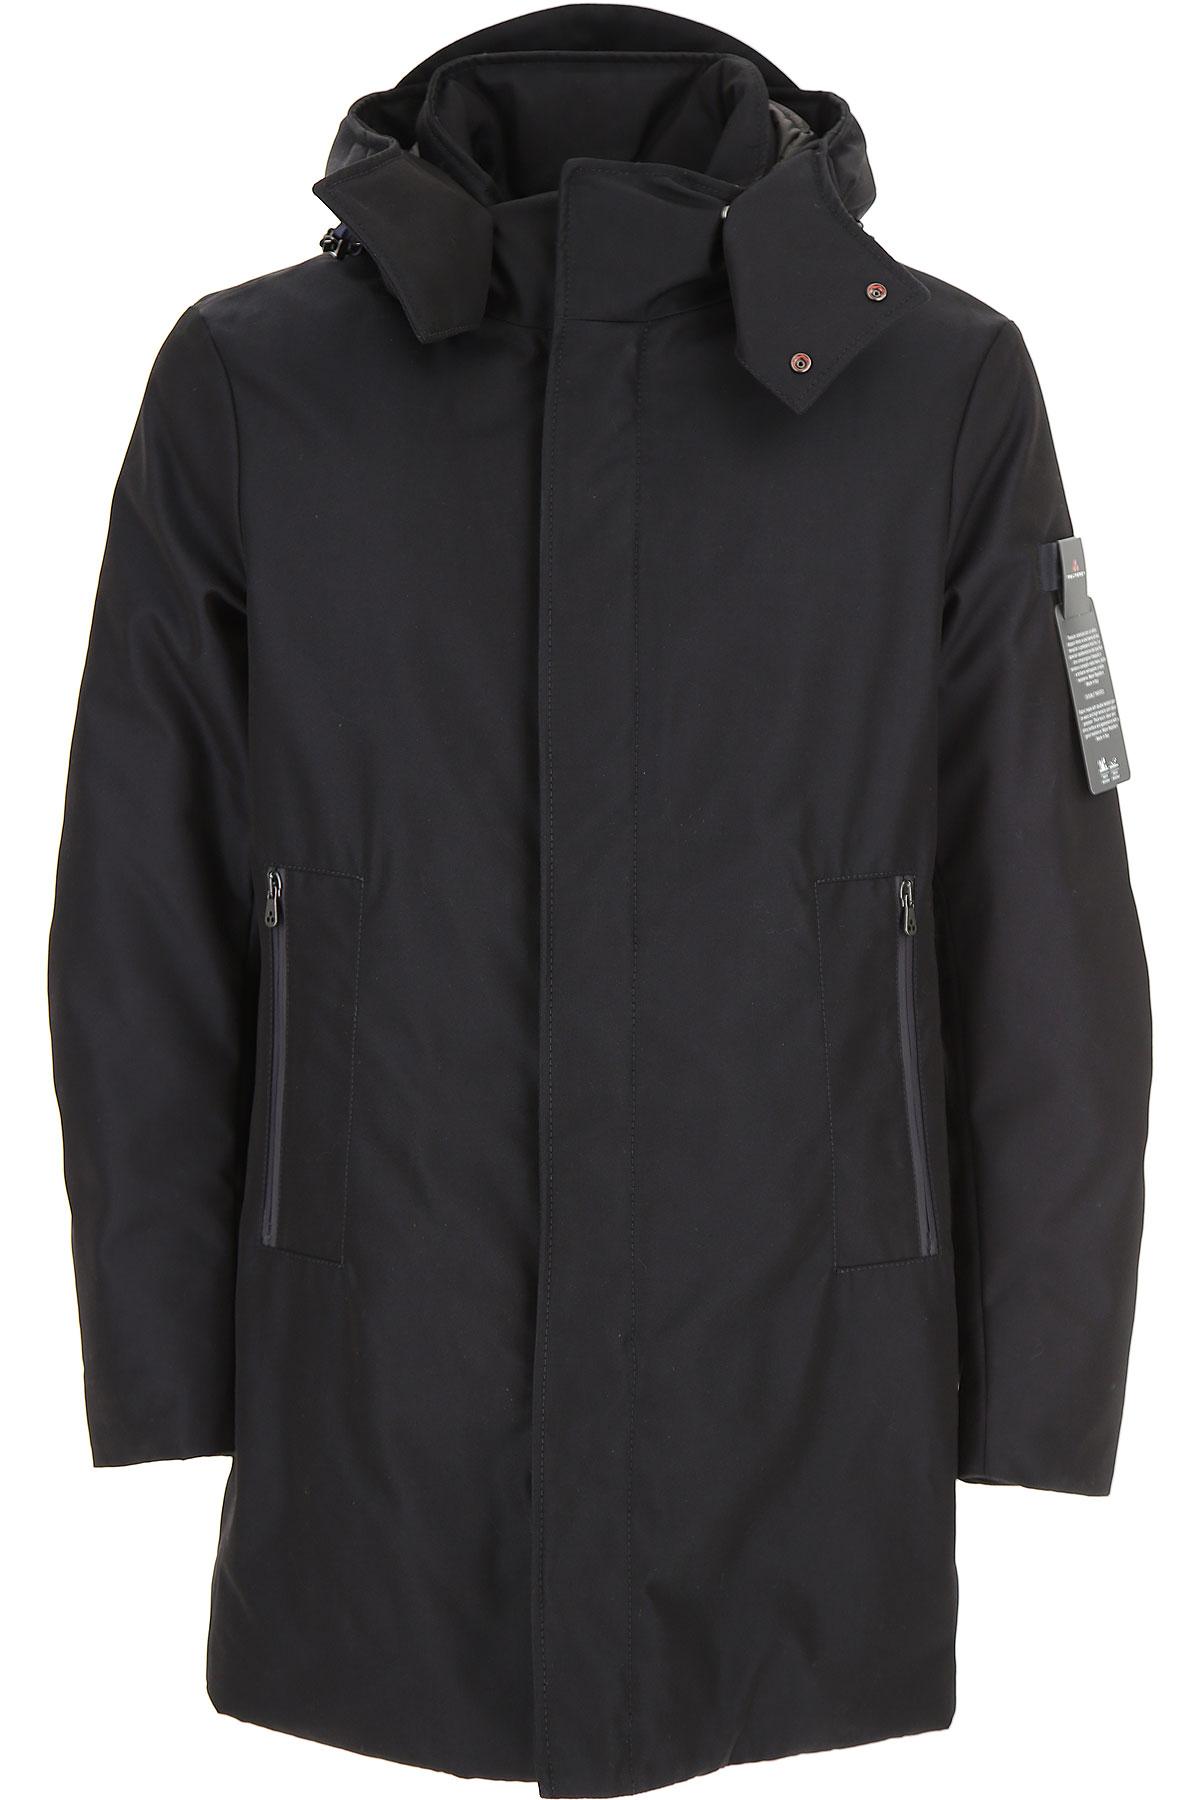 sale retailer a7e61 62b39 Mens Clothing Peuterey, Style code: 2576-sl-215